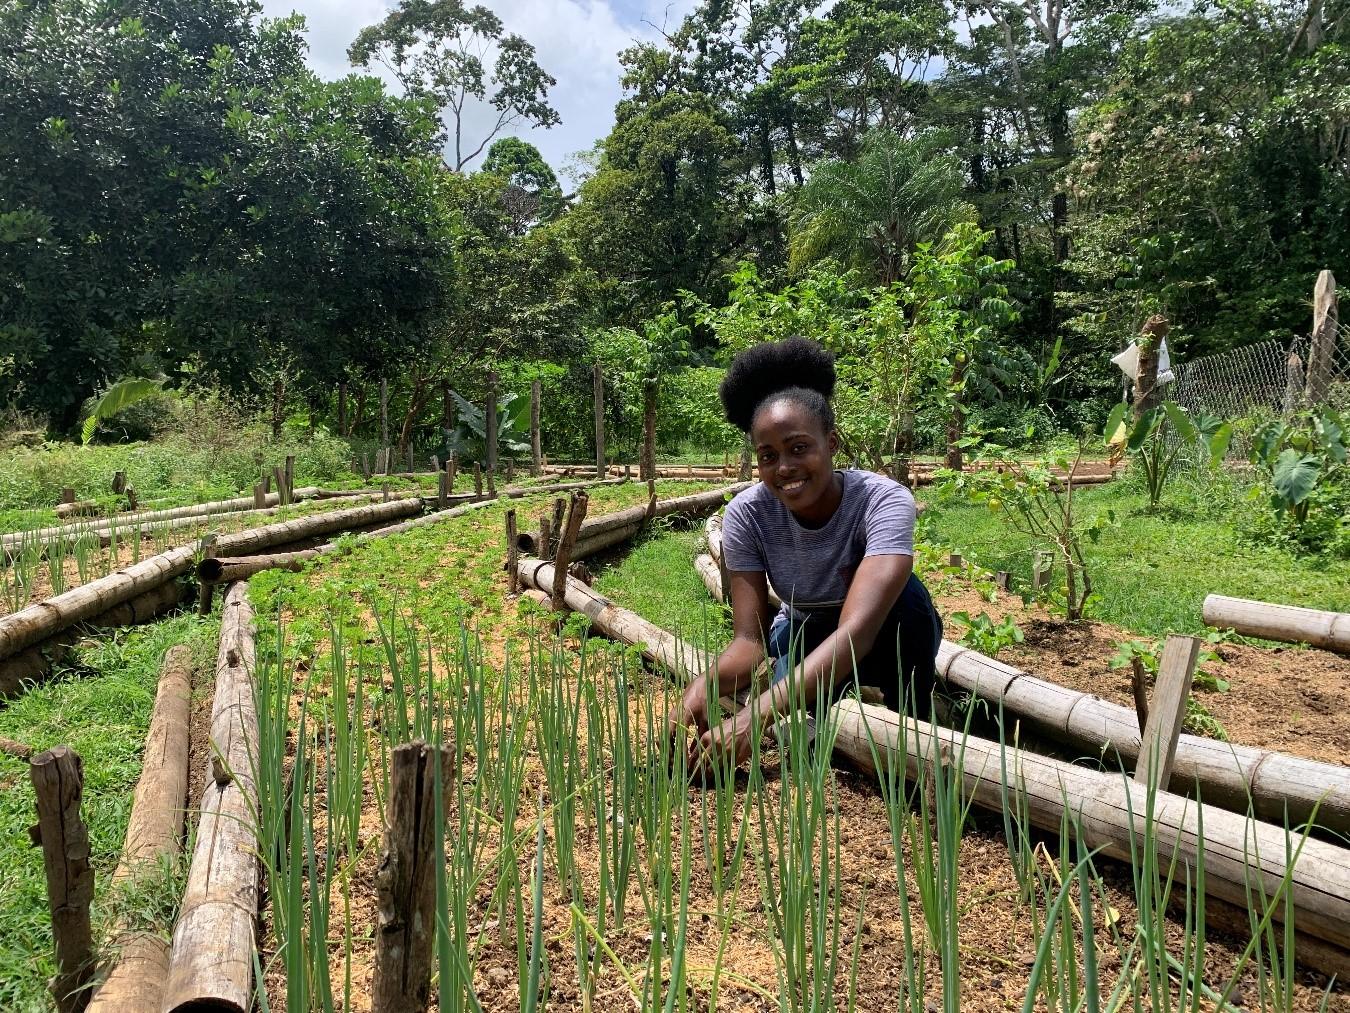 Dorcas-Lukwesa-89884-CAMA-Zam-Earth-climate-agri-Kidist-Tessema-Derese-March-2021